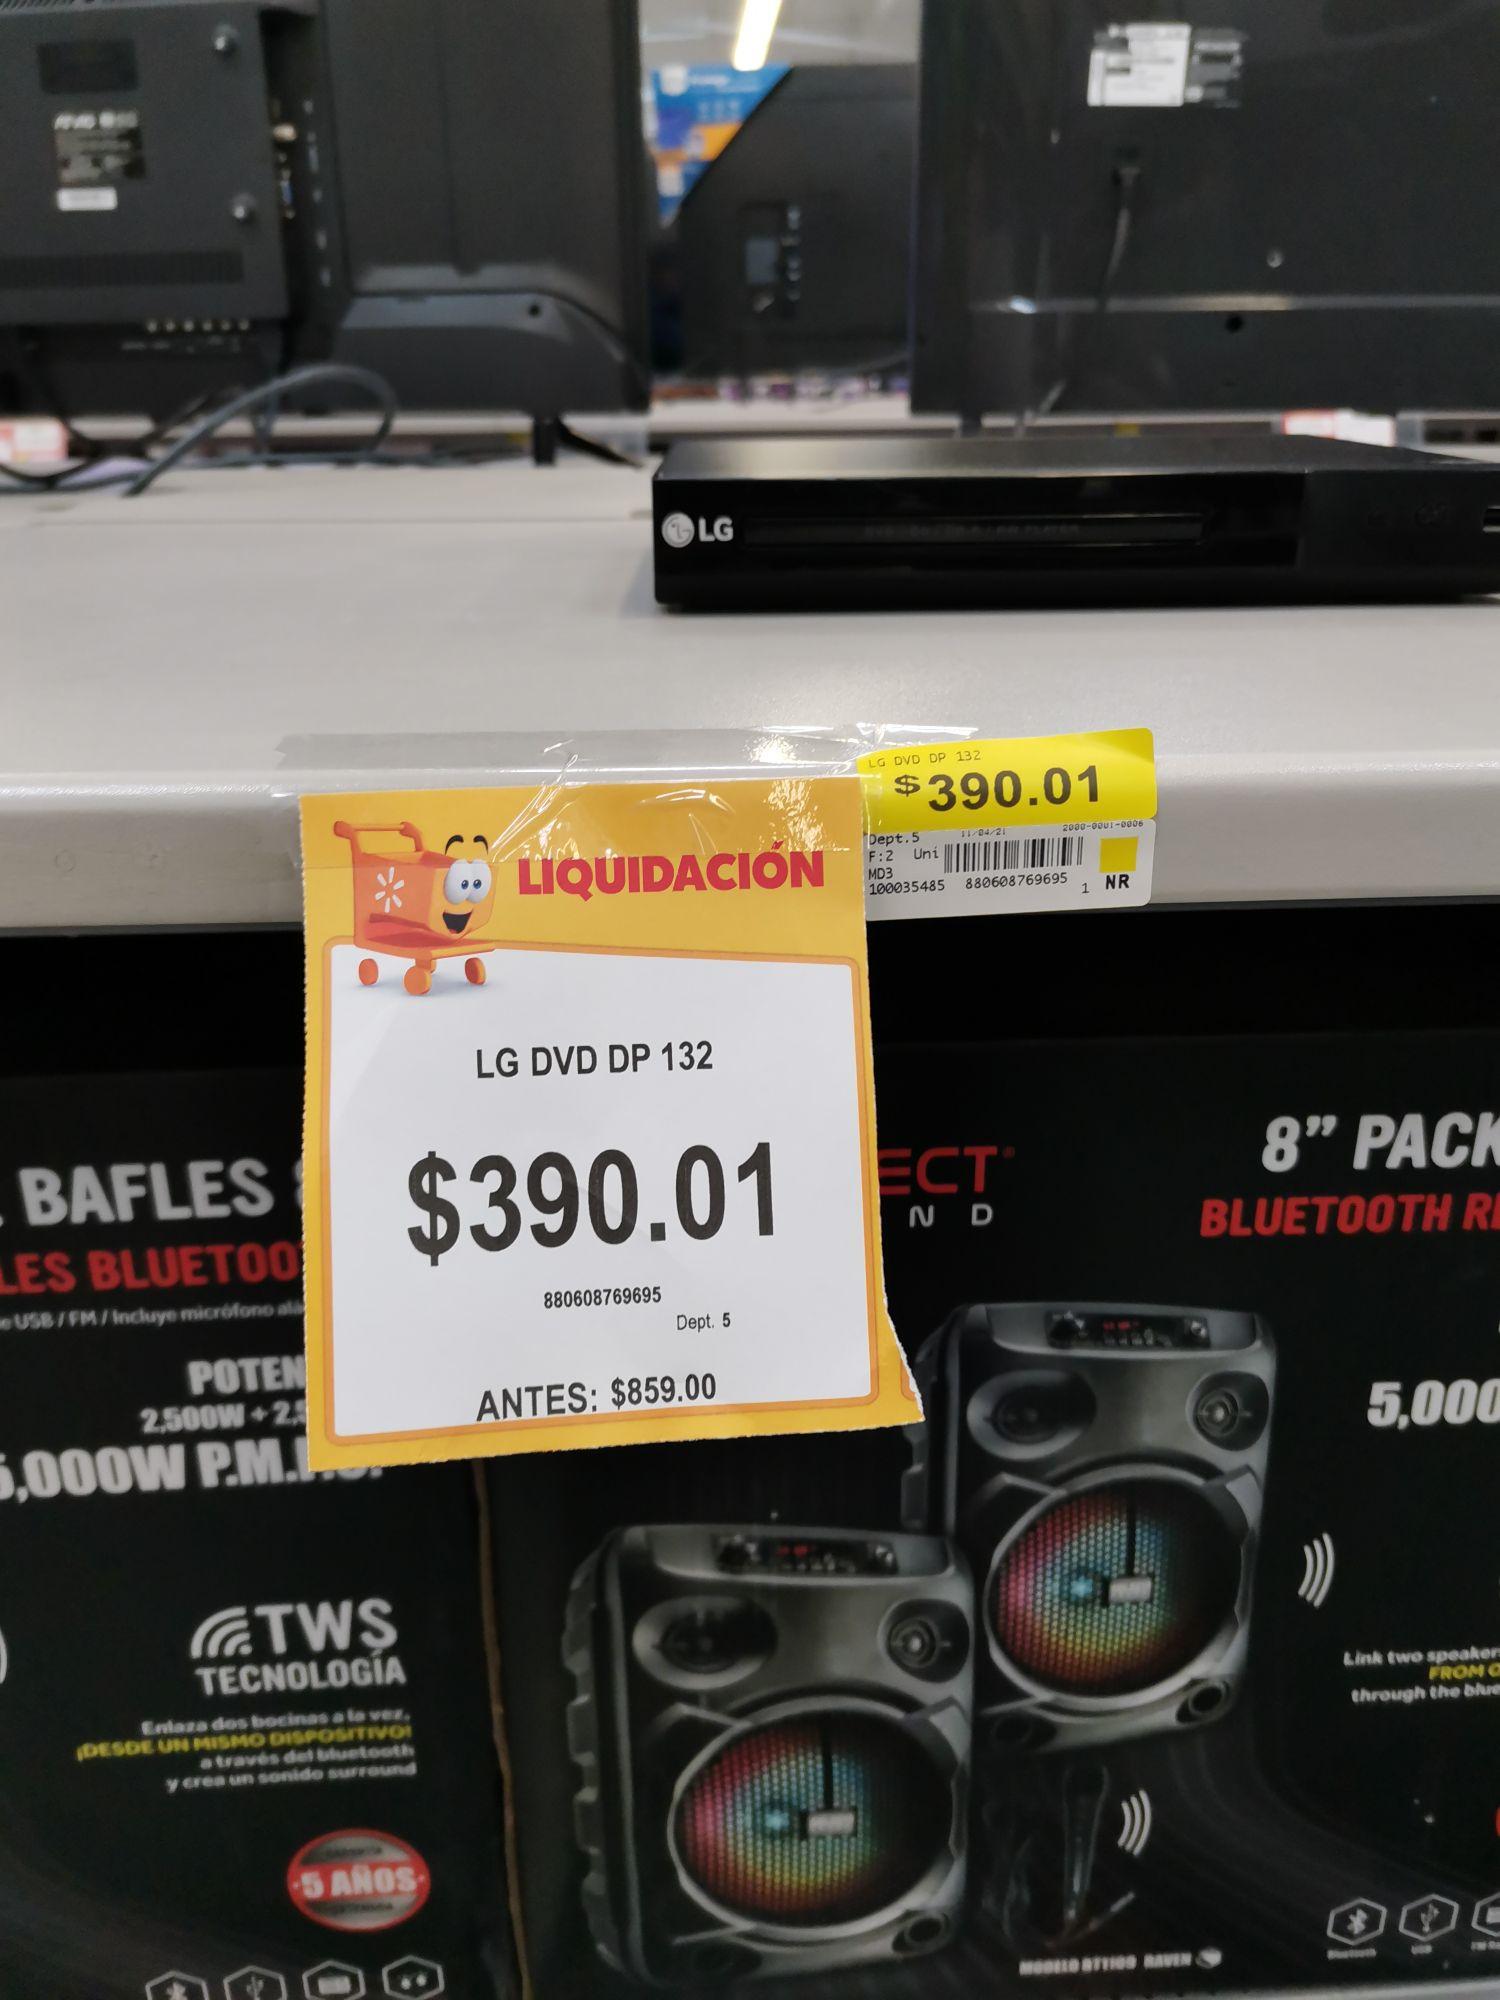 Walmart Miramontes, Reproductor de DVD DP-132 LG en 390.01